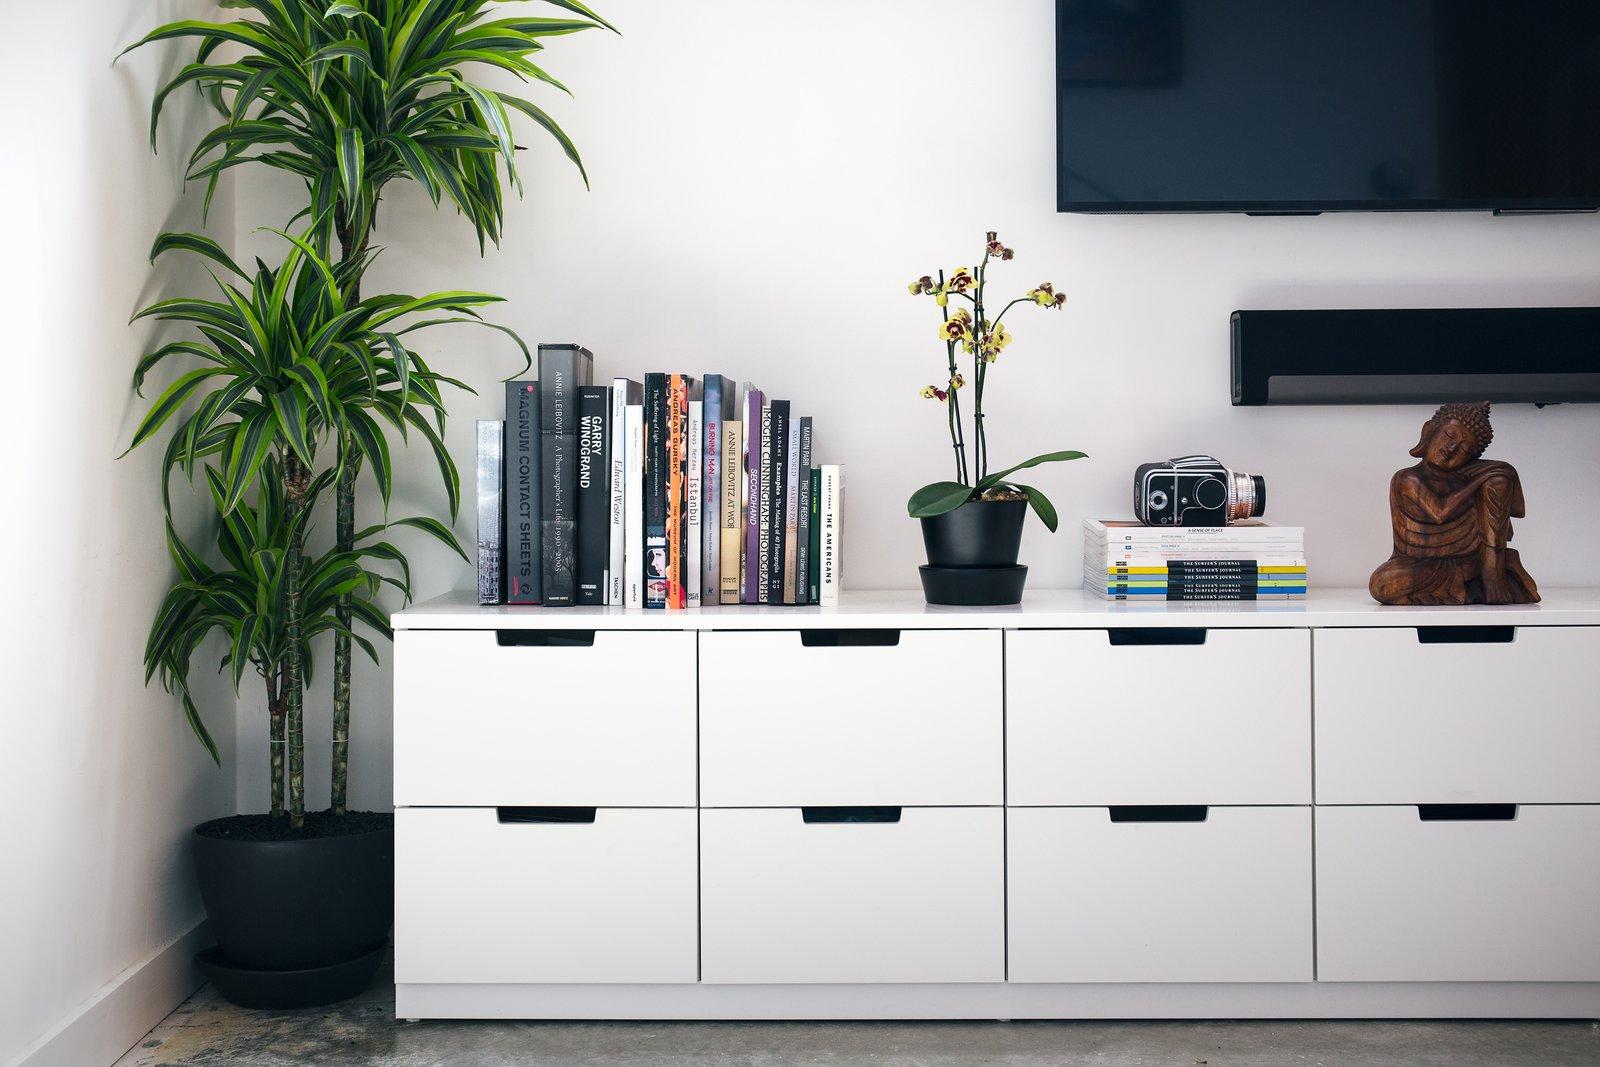 Mission Loft IKEA storage